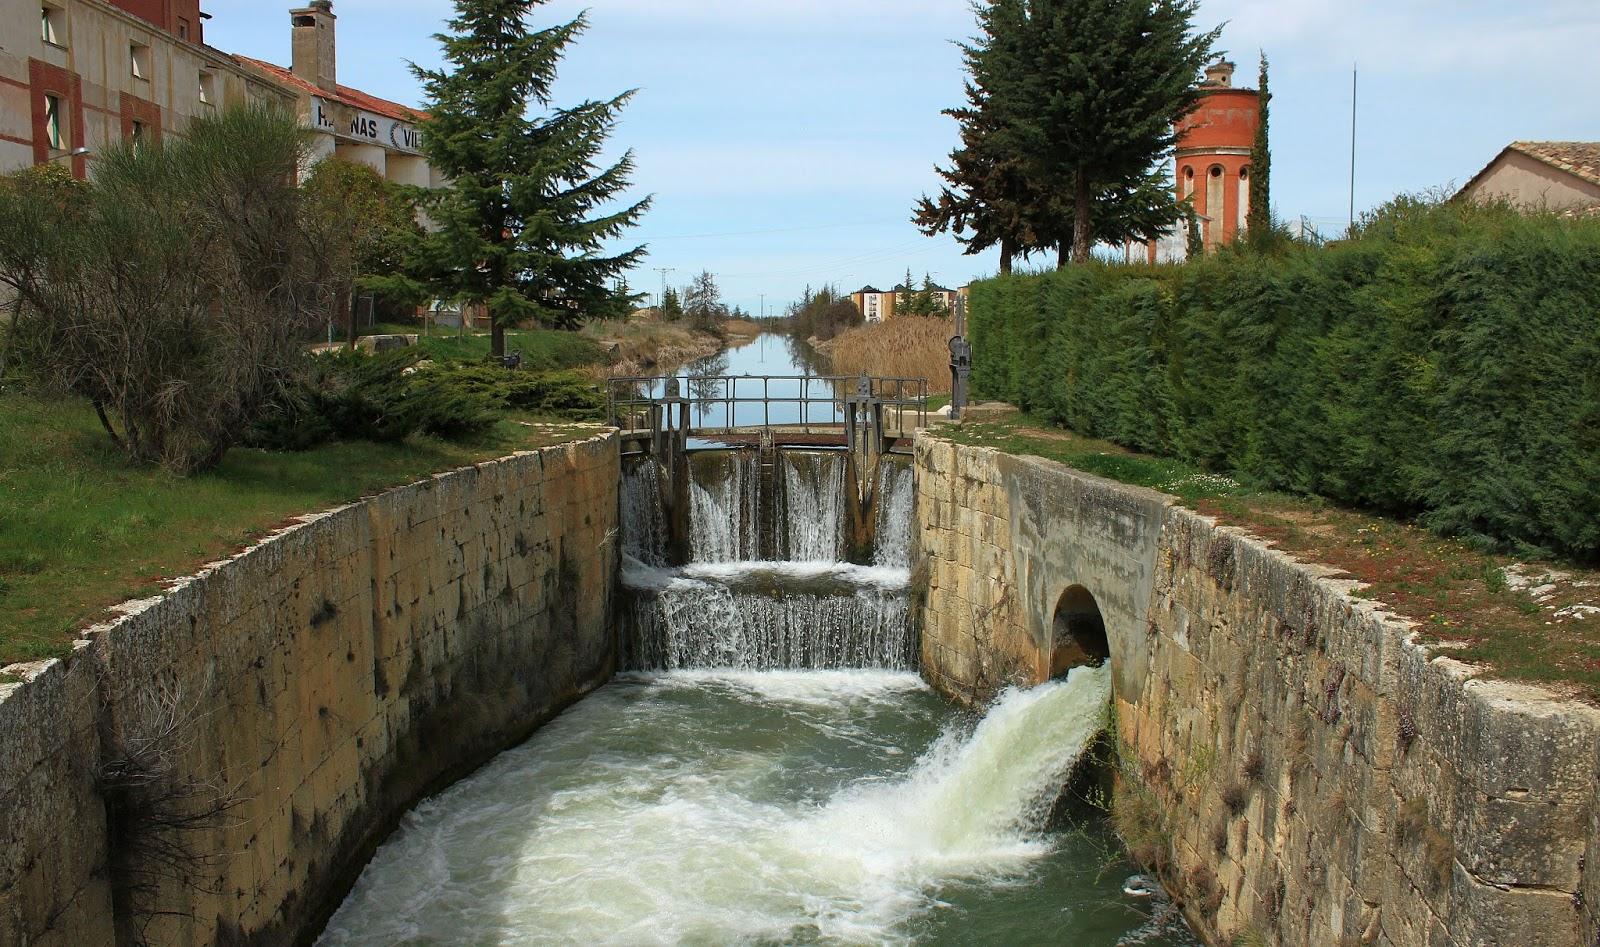 Esclusa Canal de Castilla-Villamuriel